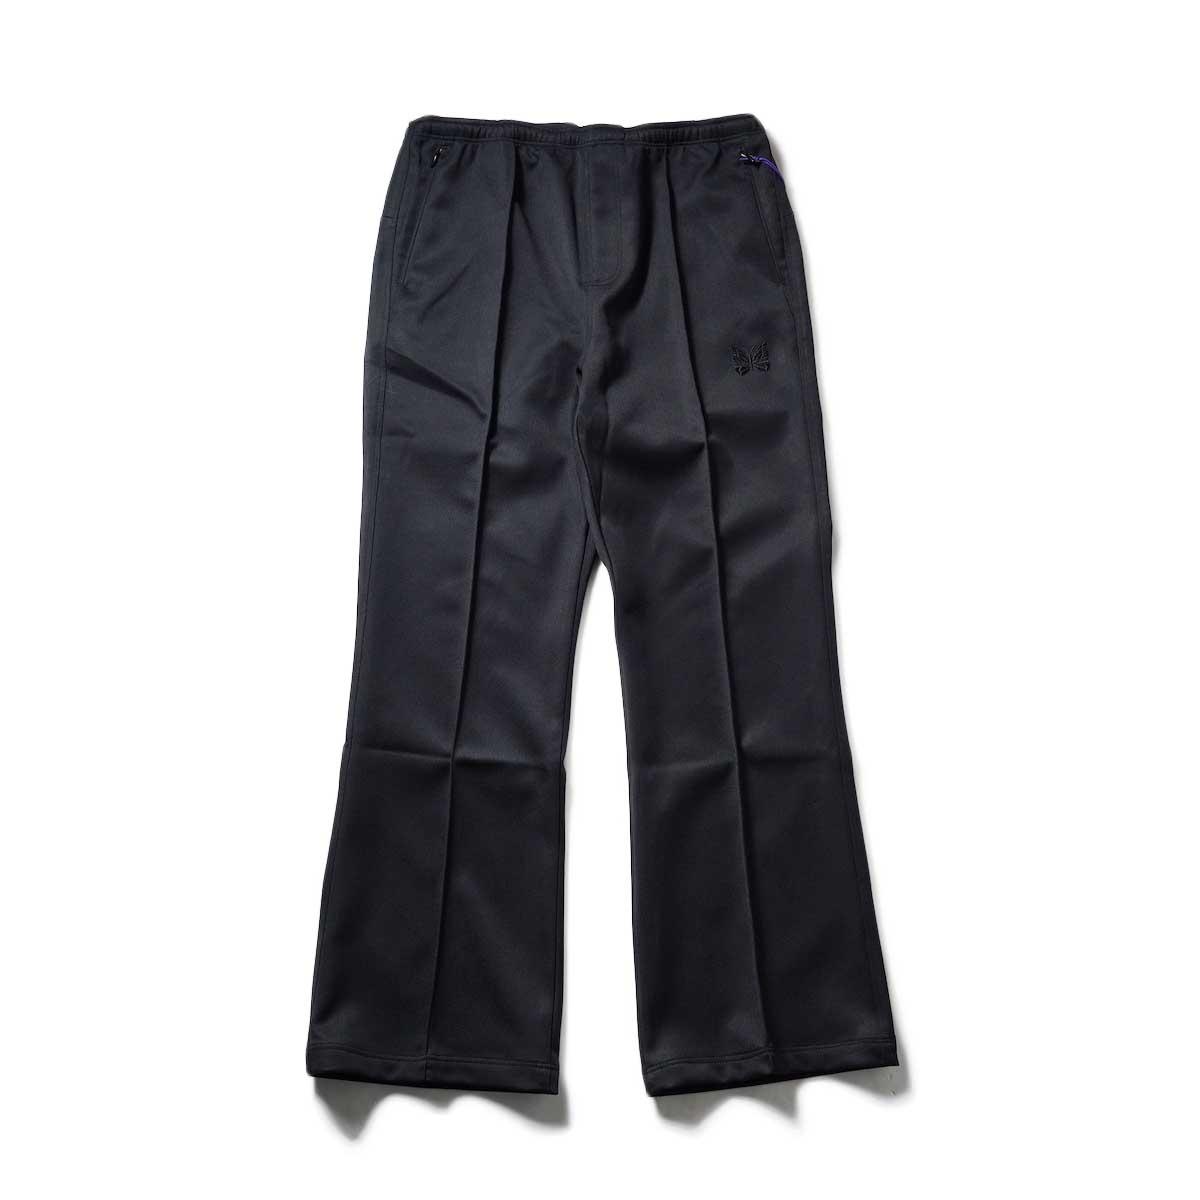 Needles / W.U. BOOT-CUT PANT - PE/R DOESKIN (Black)